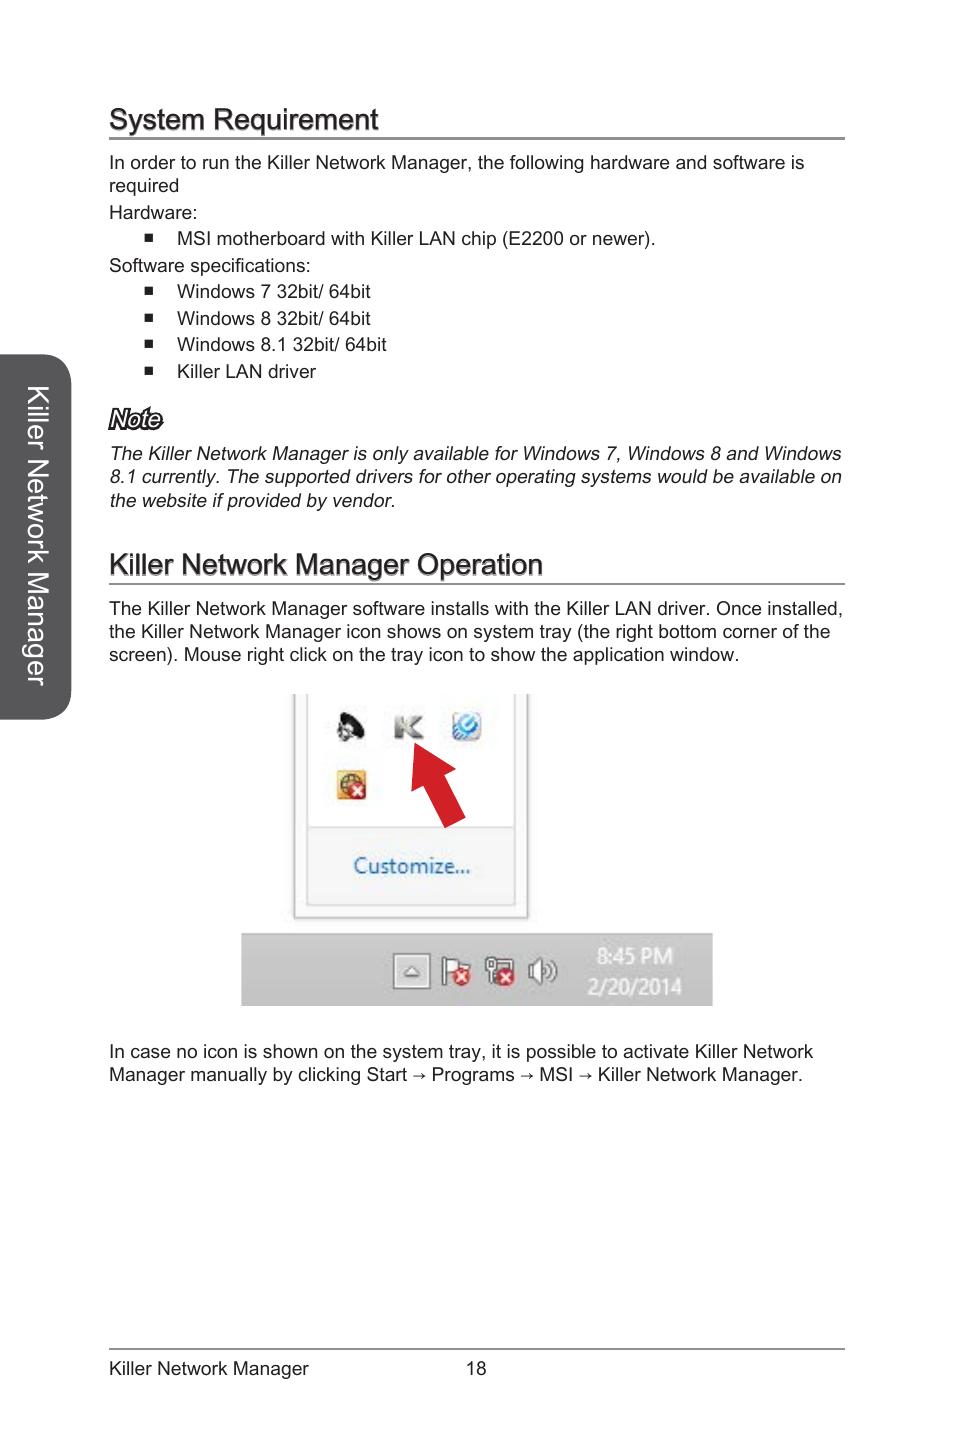 Killer network manager, System requirement, Killer network